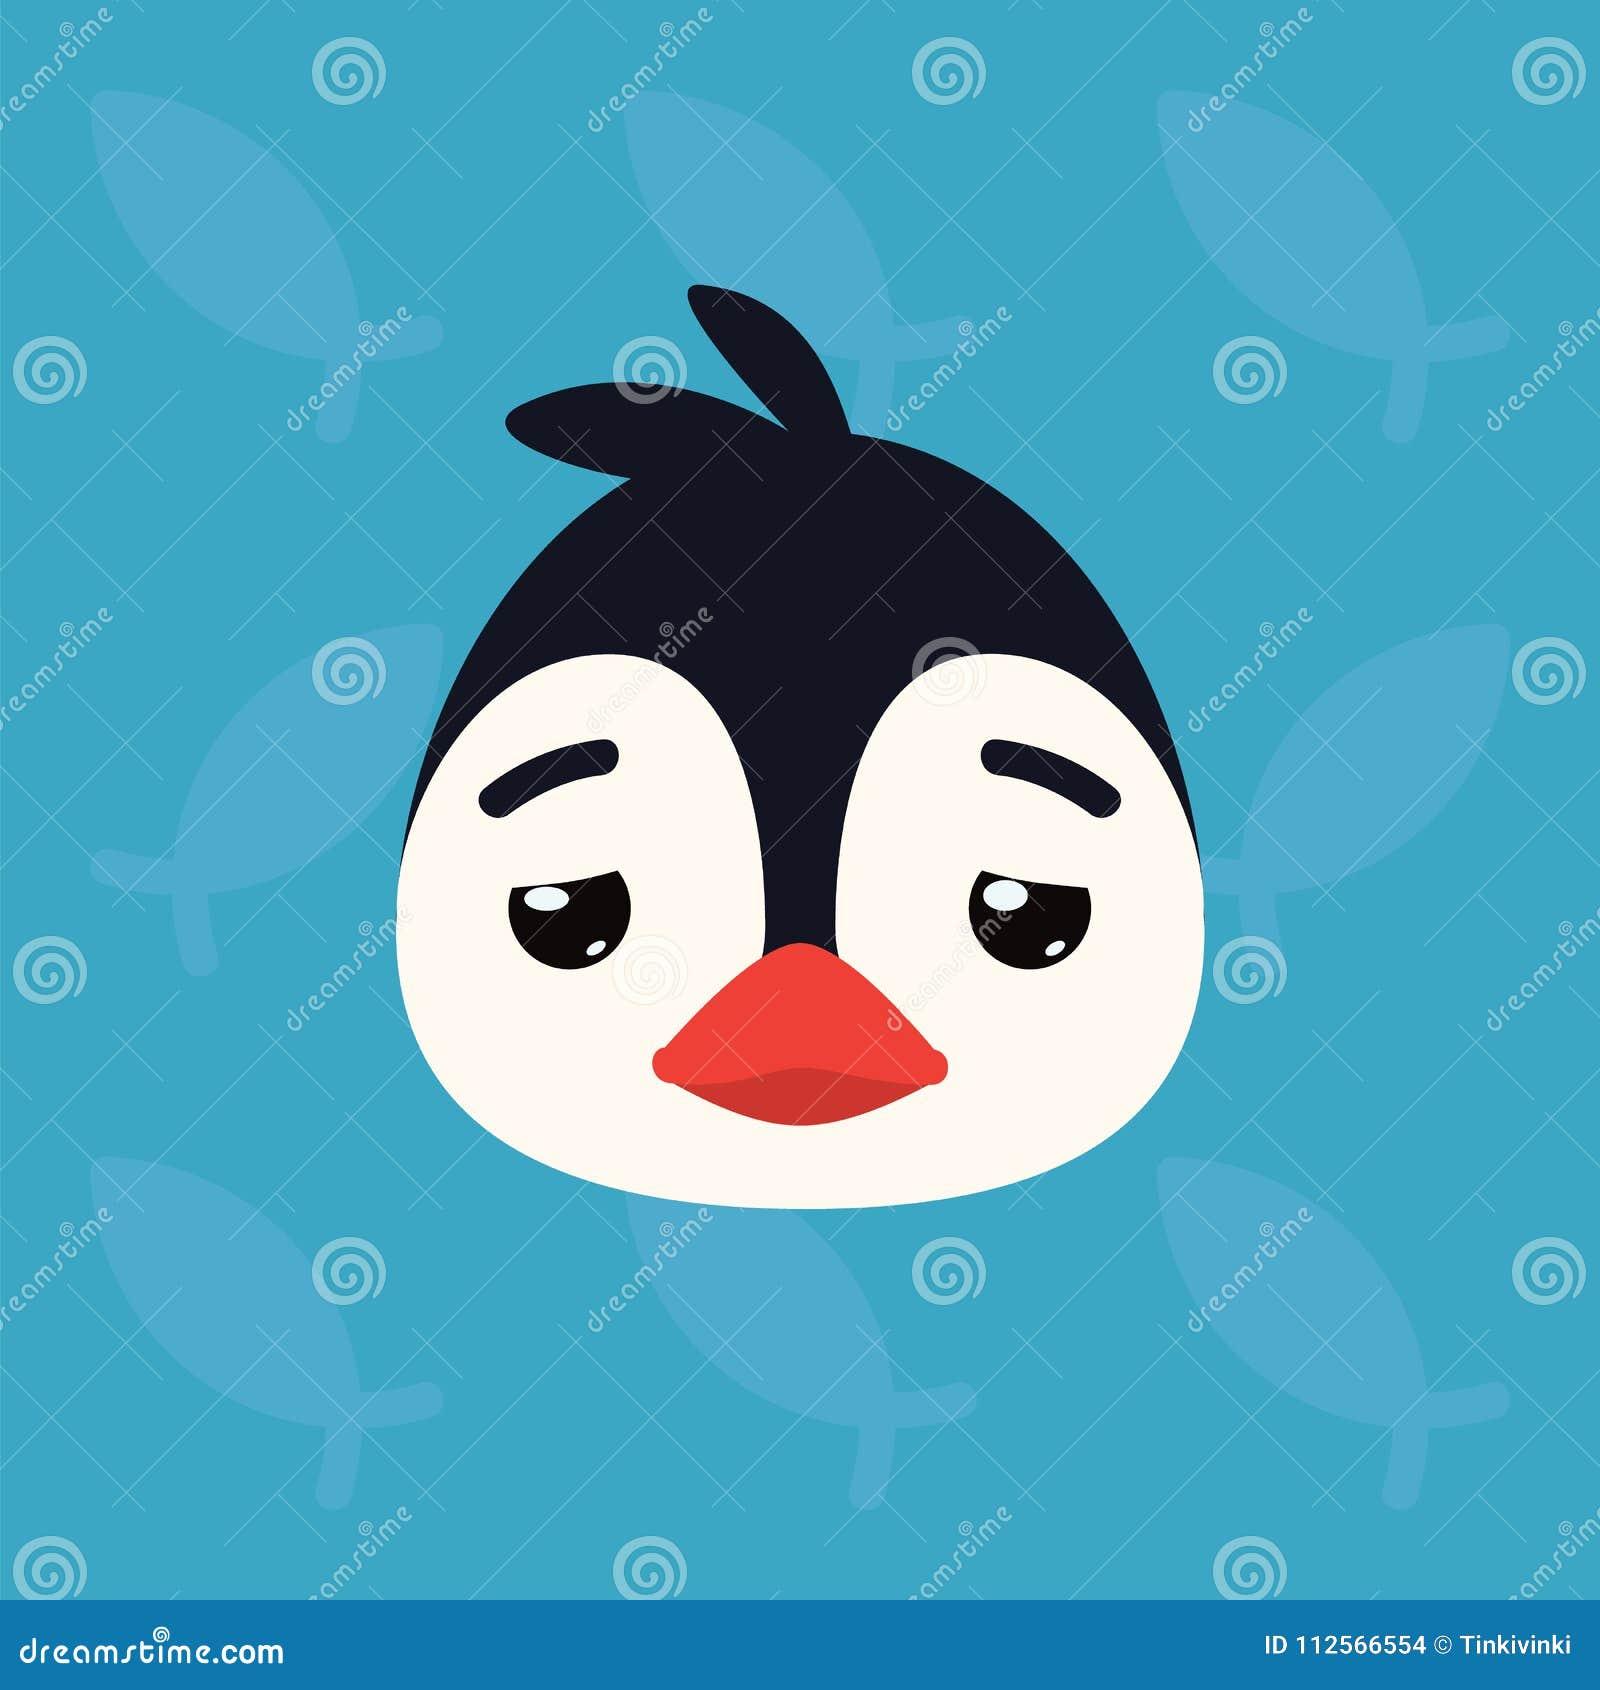 Penguin Emotional Head  Vector Illustration Of Cute Arctic Bird